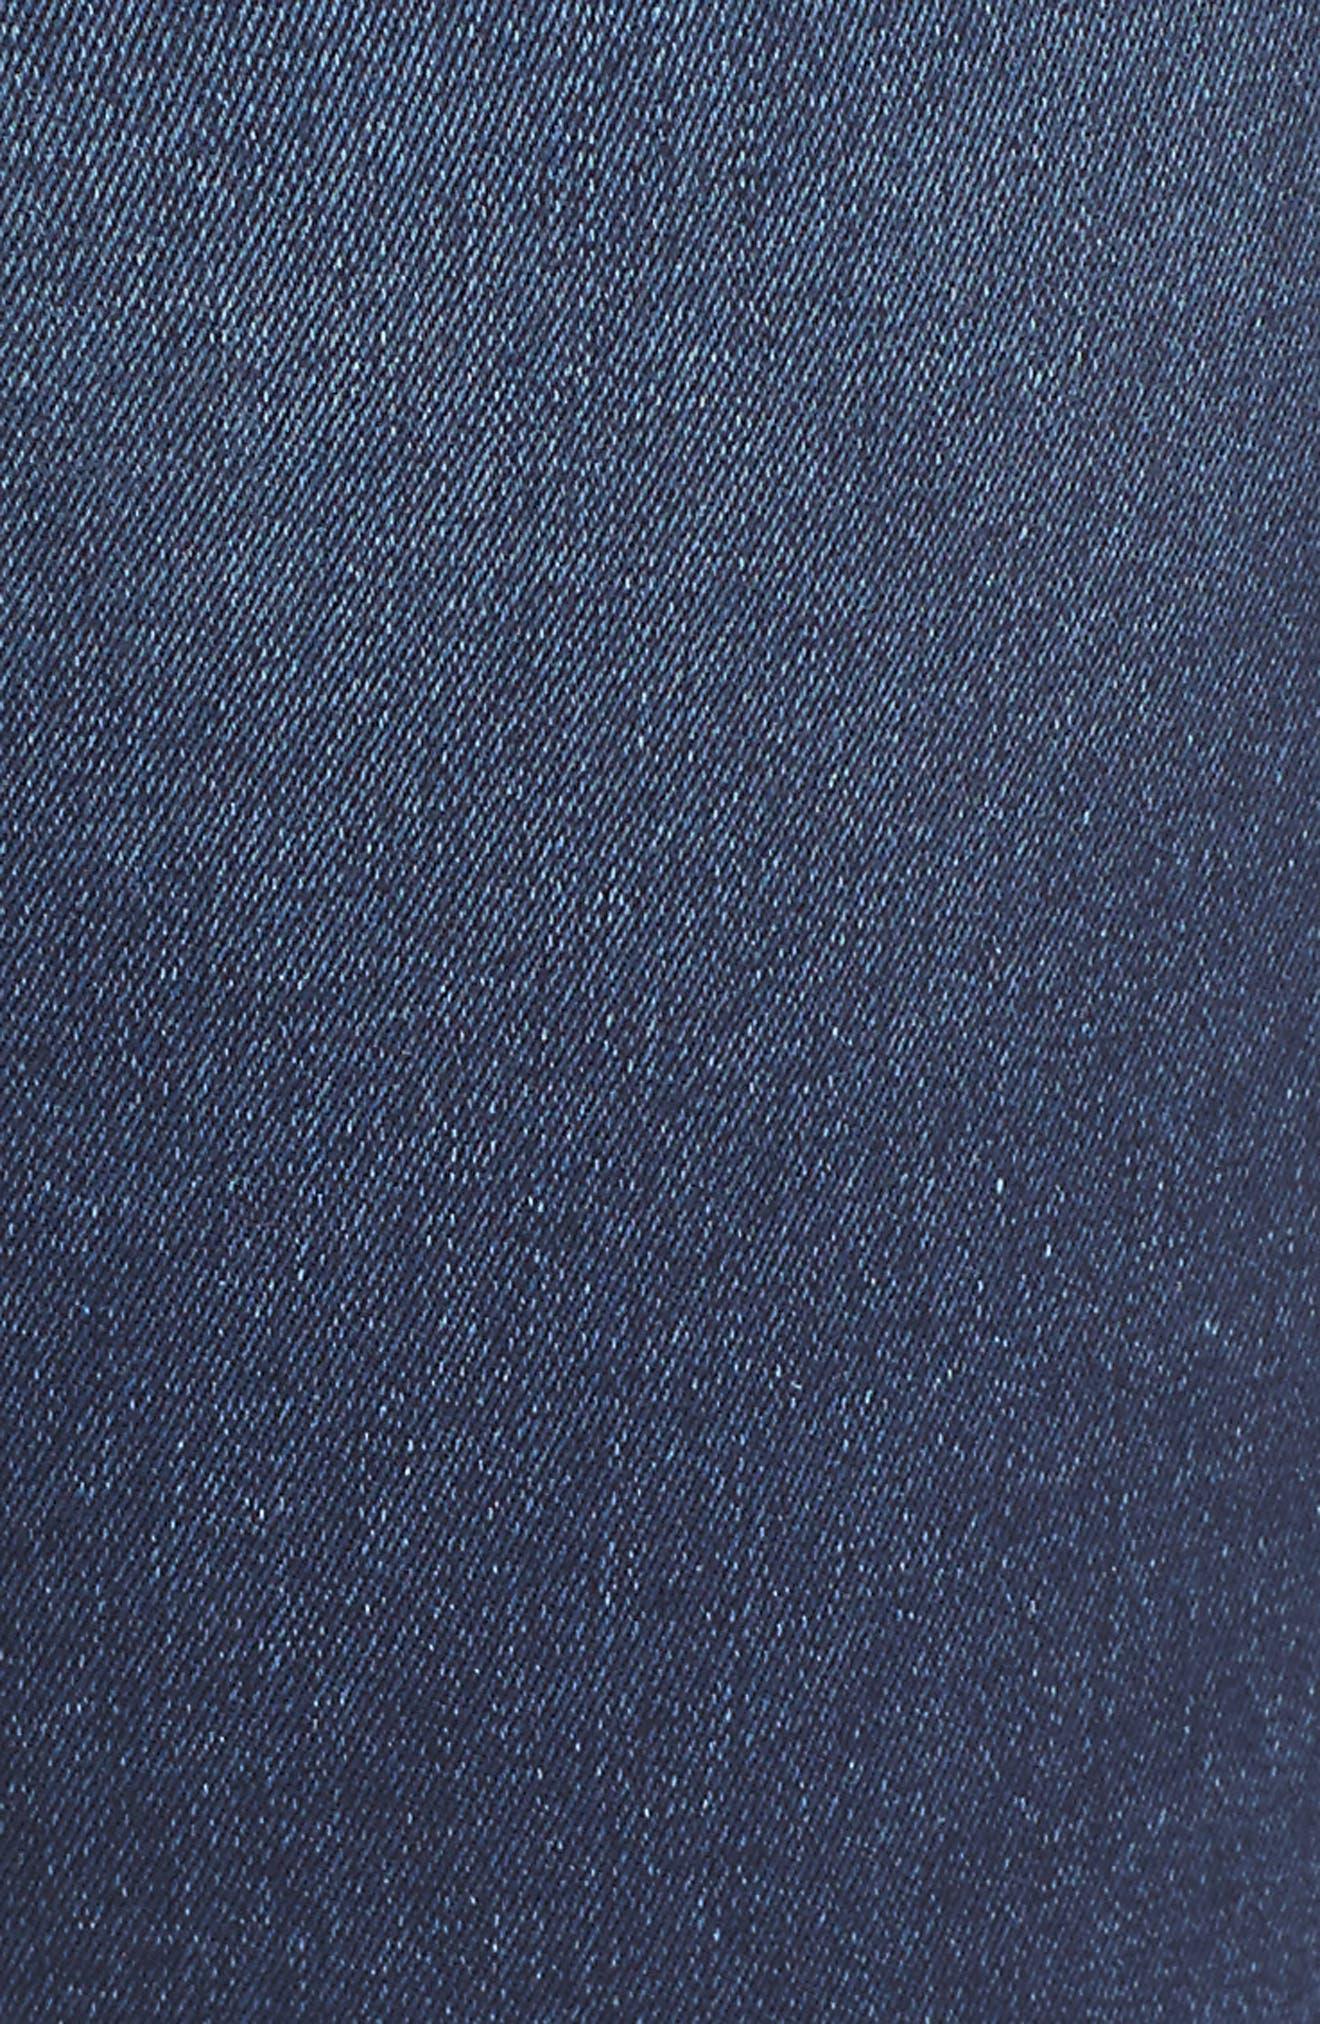 Alternate Image 5  - KUT from the Kloth Jennifer Ultra Skinny Jeans (Fashionable)